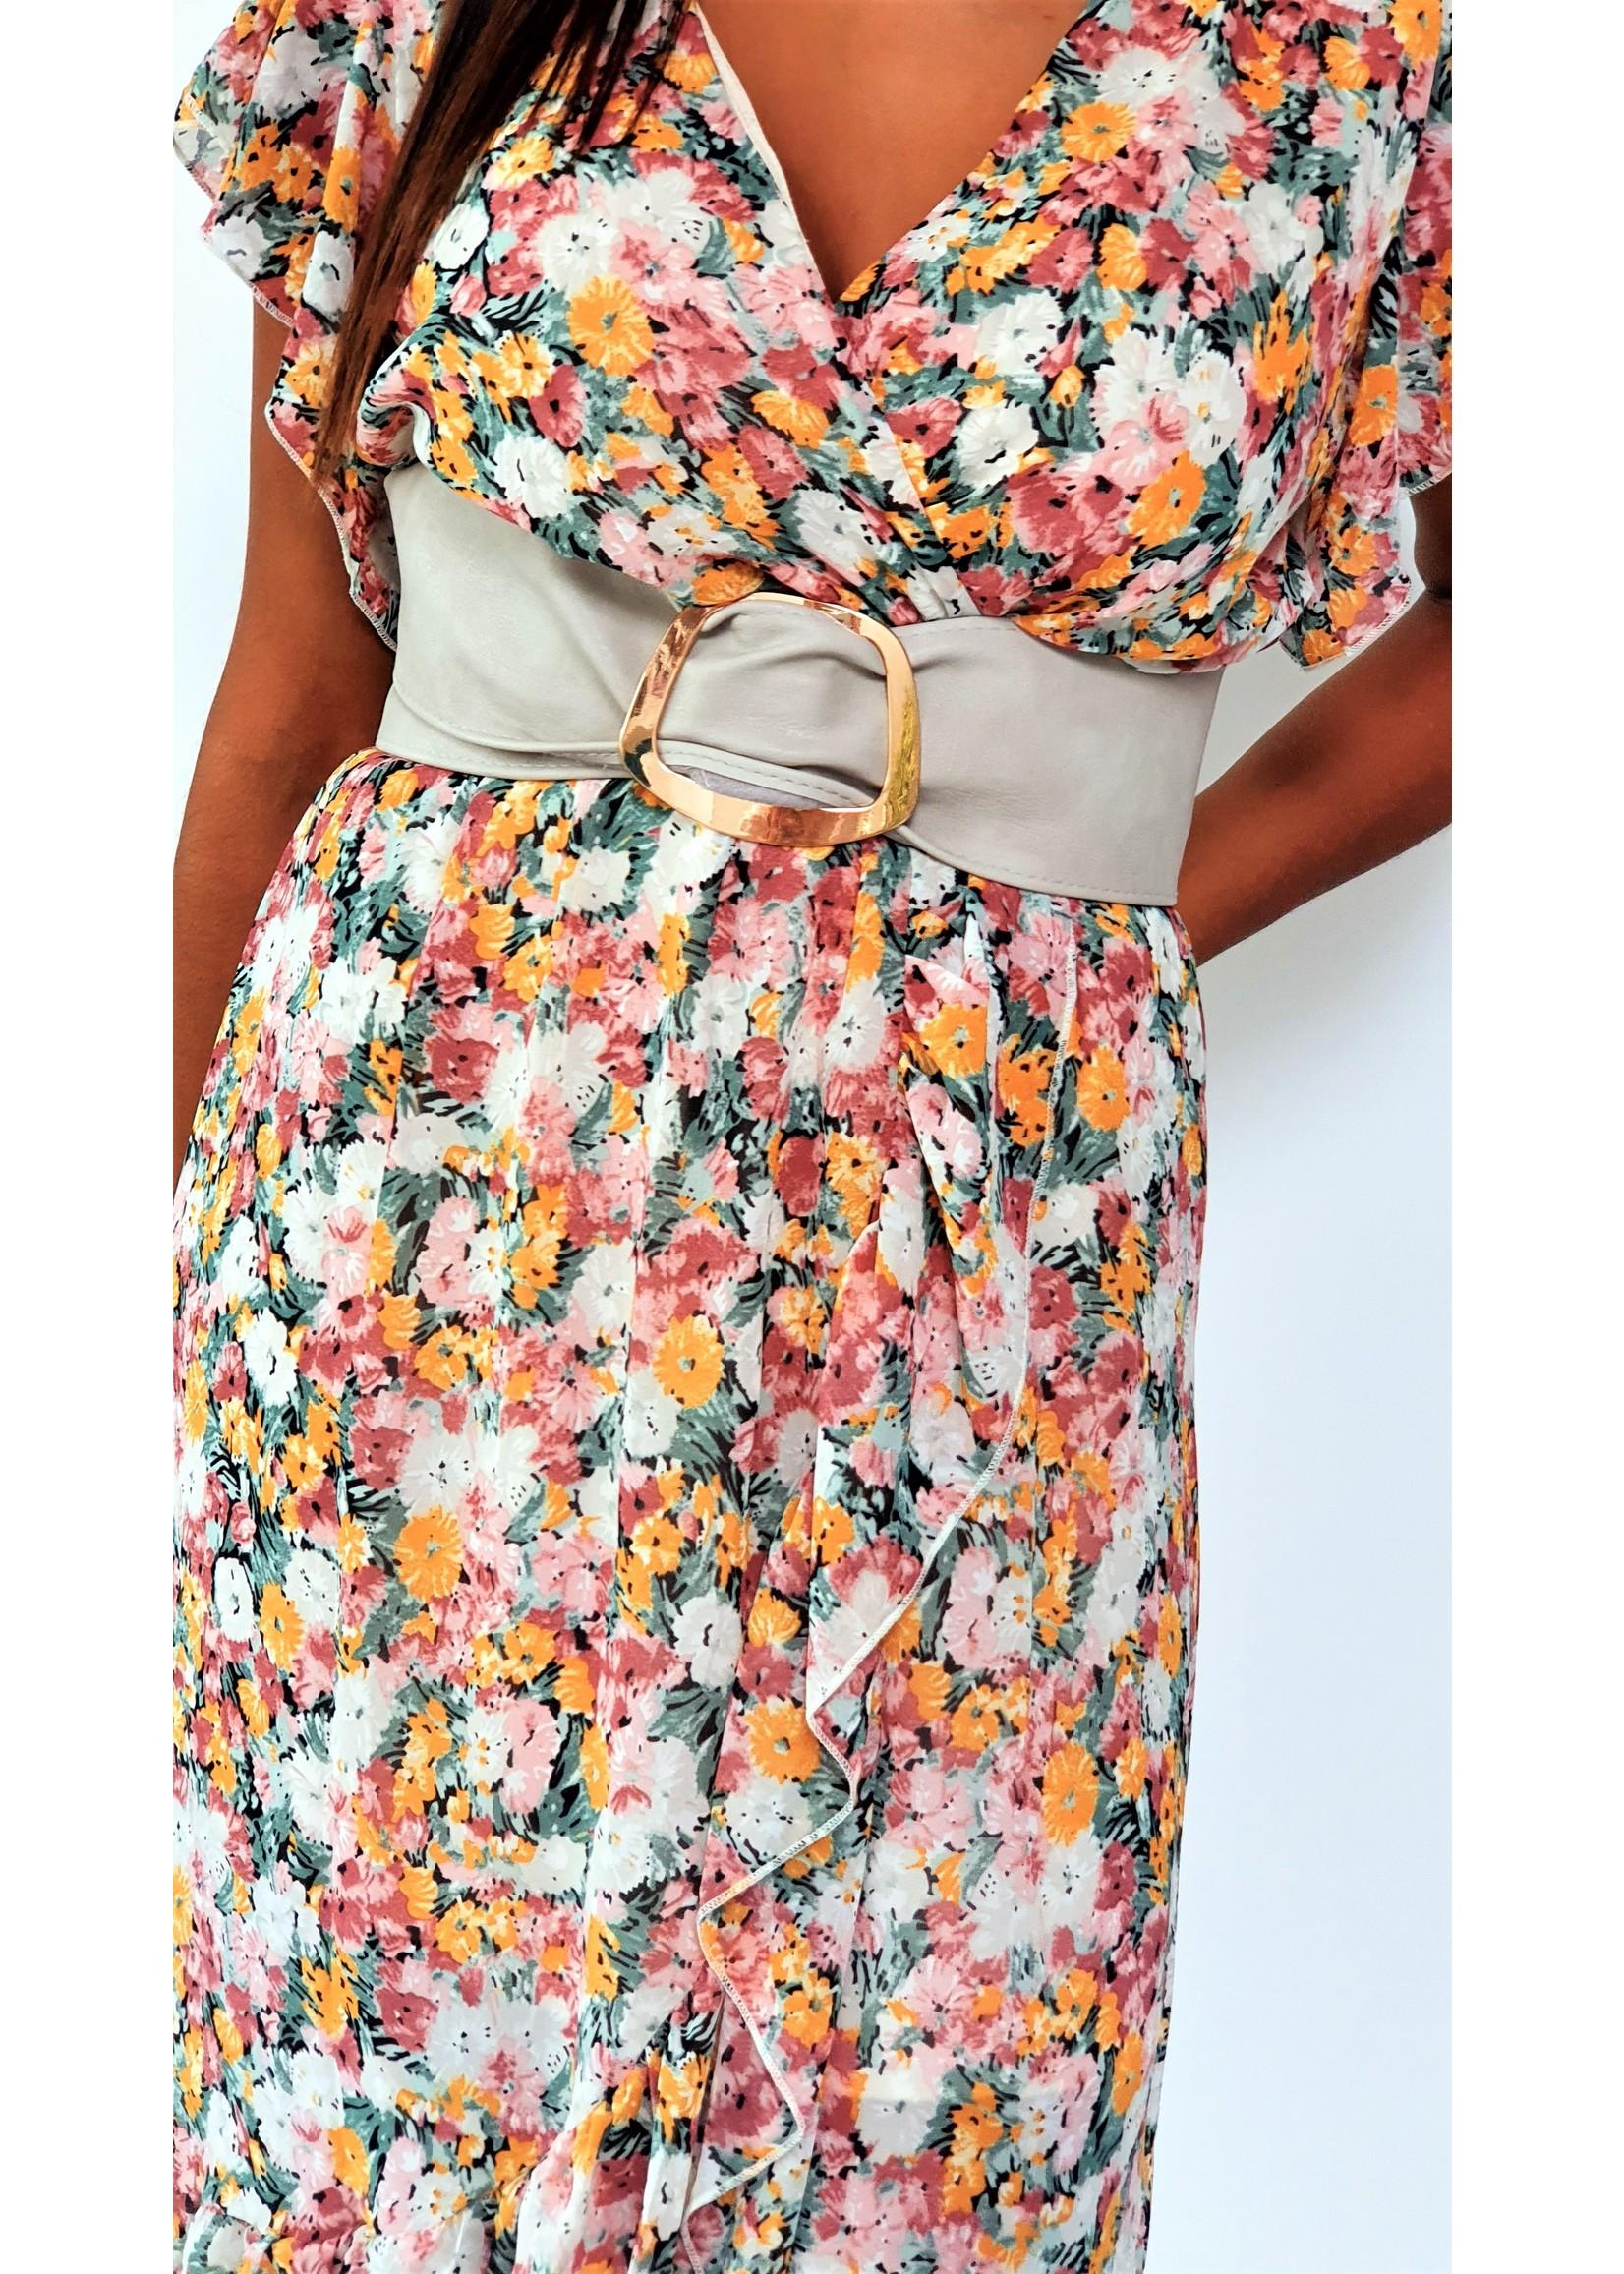 Thé perfect flower dress